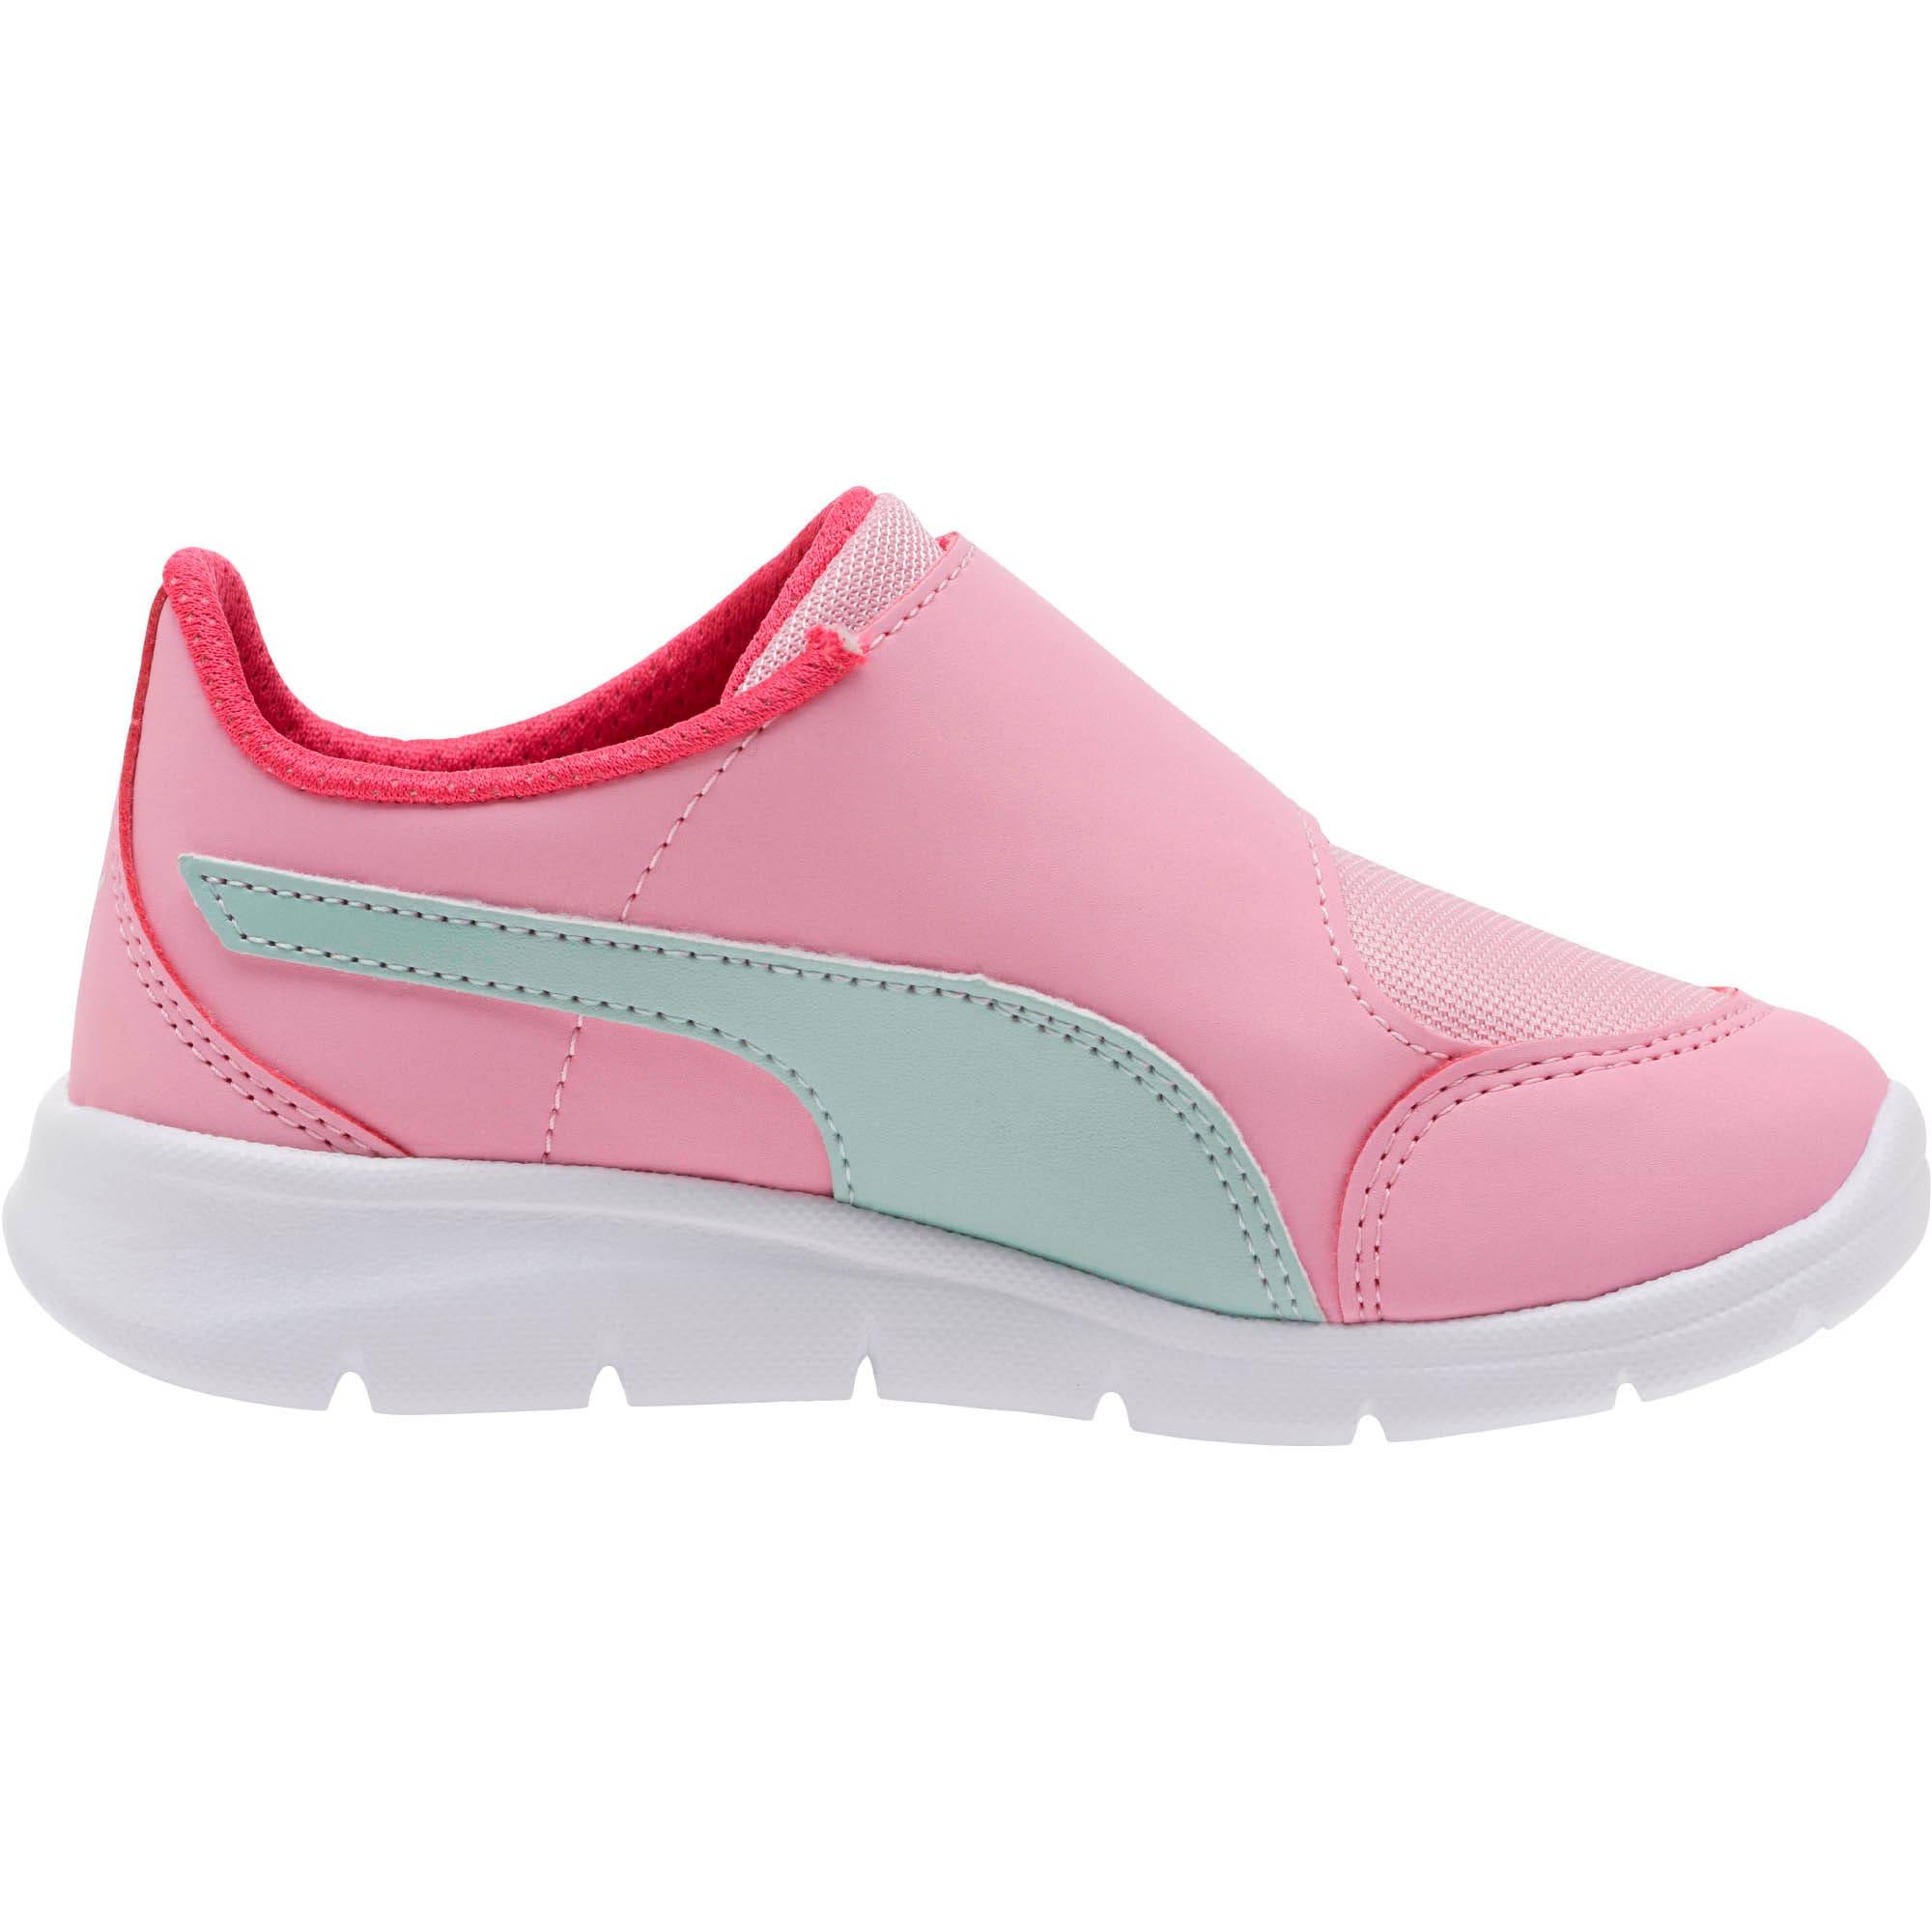 Thumbnail 3 of Bao 3 AC Little Kids' Shoes, Pale Pink-Fair Aqua-Purple, medium